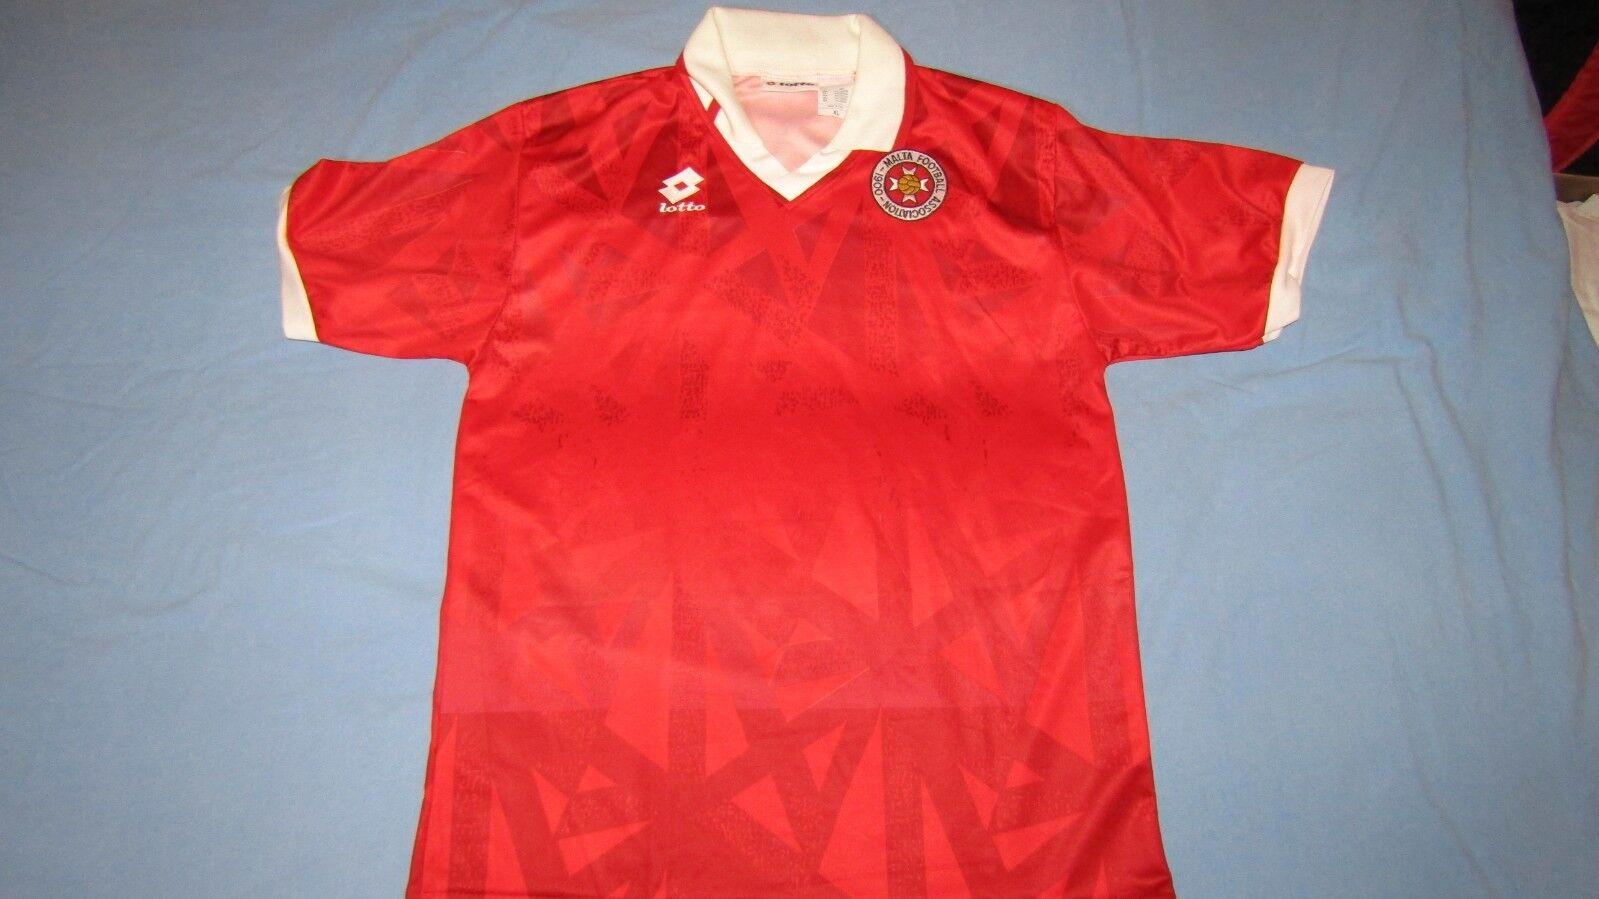 Malta Lotto, Camiseta de fútbol, XL, perfecto, muy raro, 1994-96, MATCHWORN